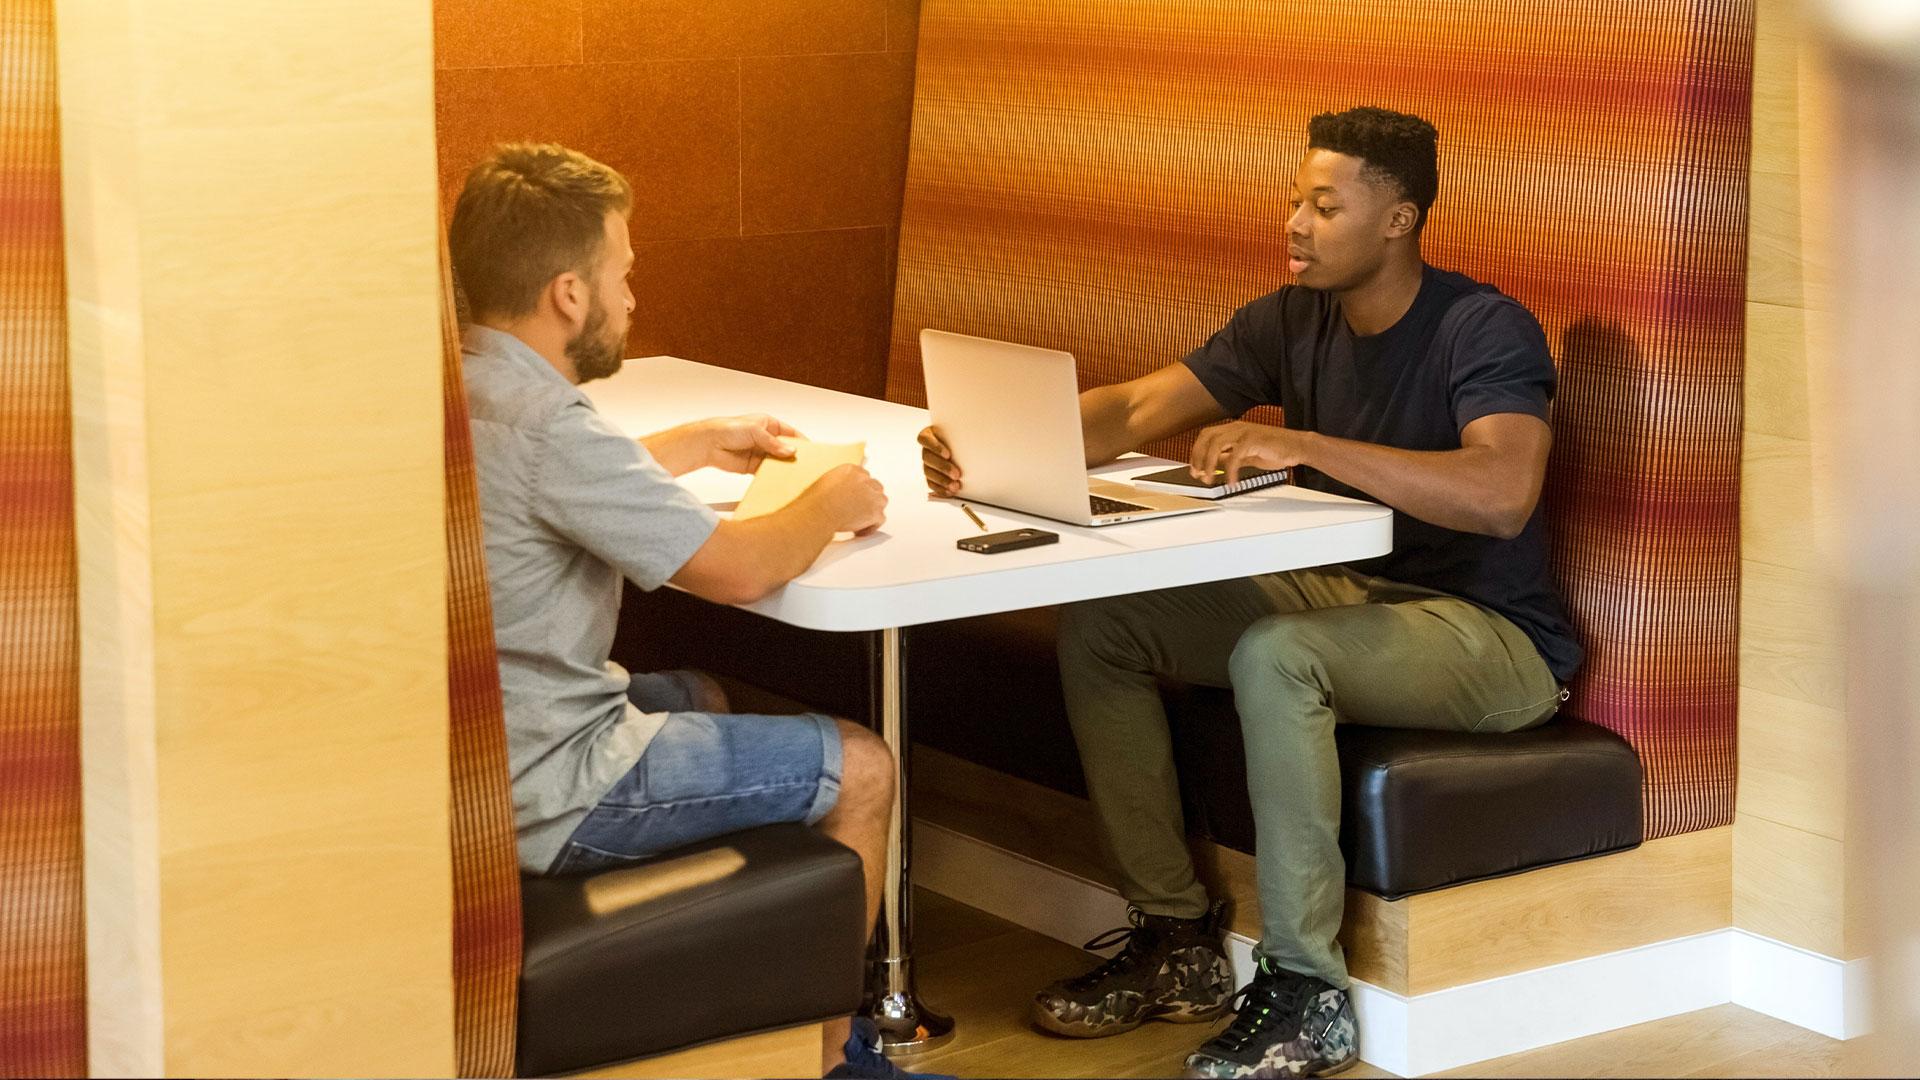 Kaksi opiskelijaa istuu ja juttelee